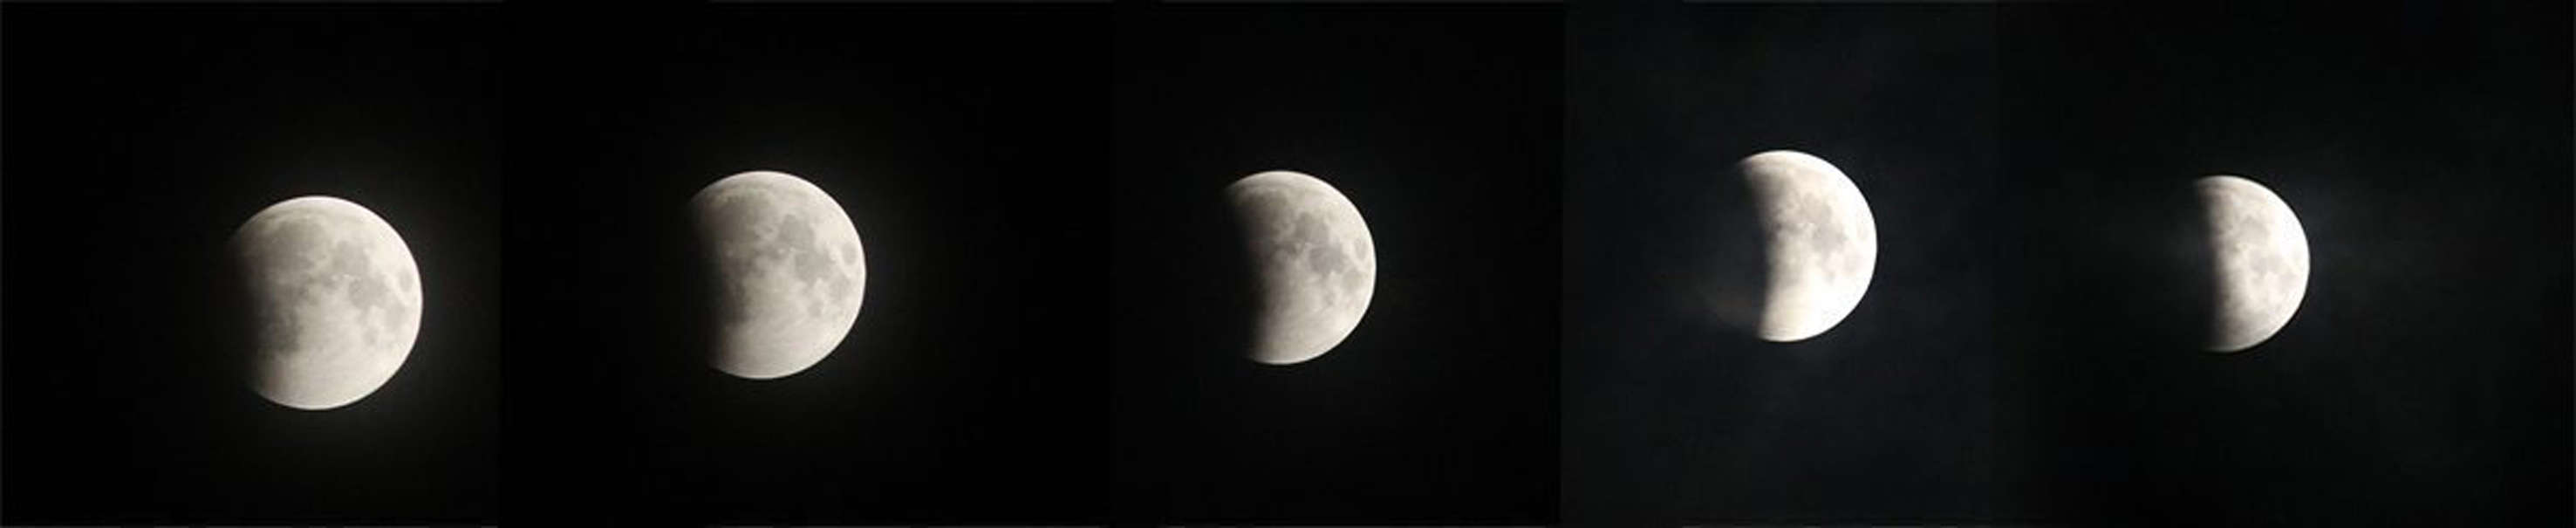 Lunar eclipse seen in Kozhikode. (PTI photo)